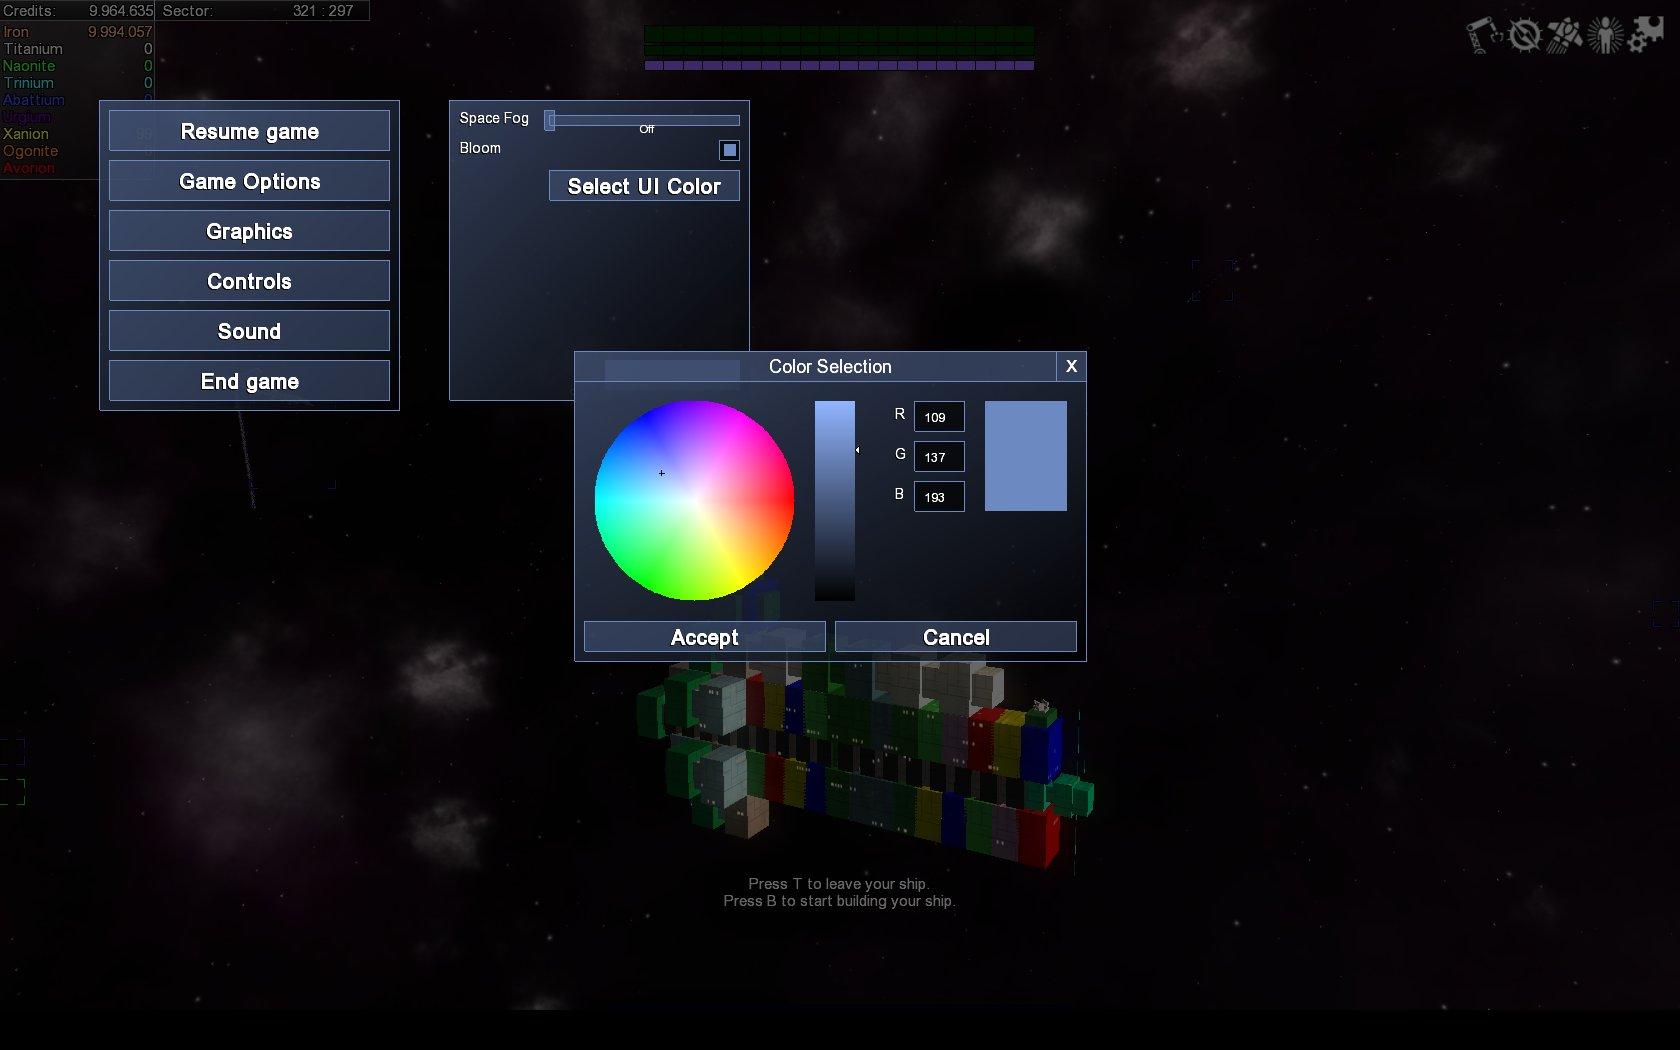 Choosing UI Colors